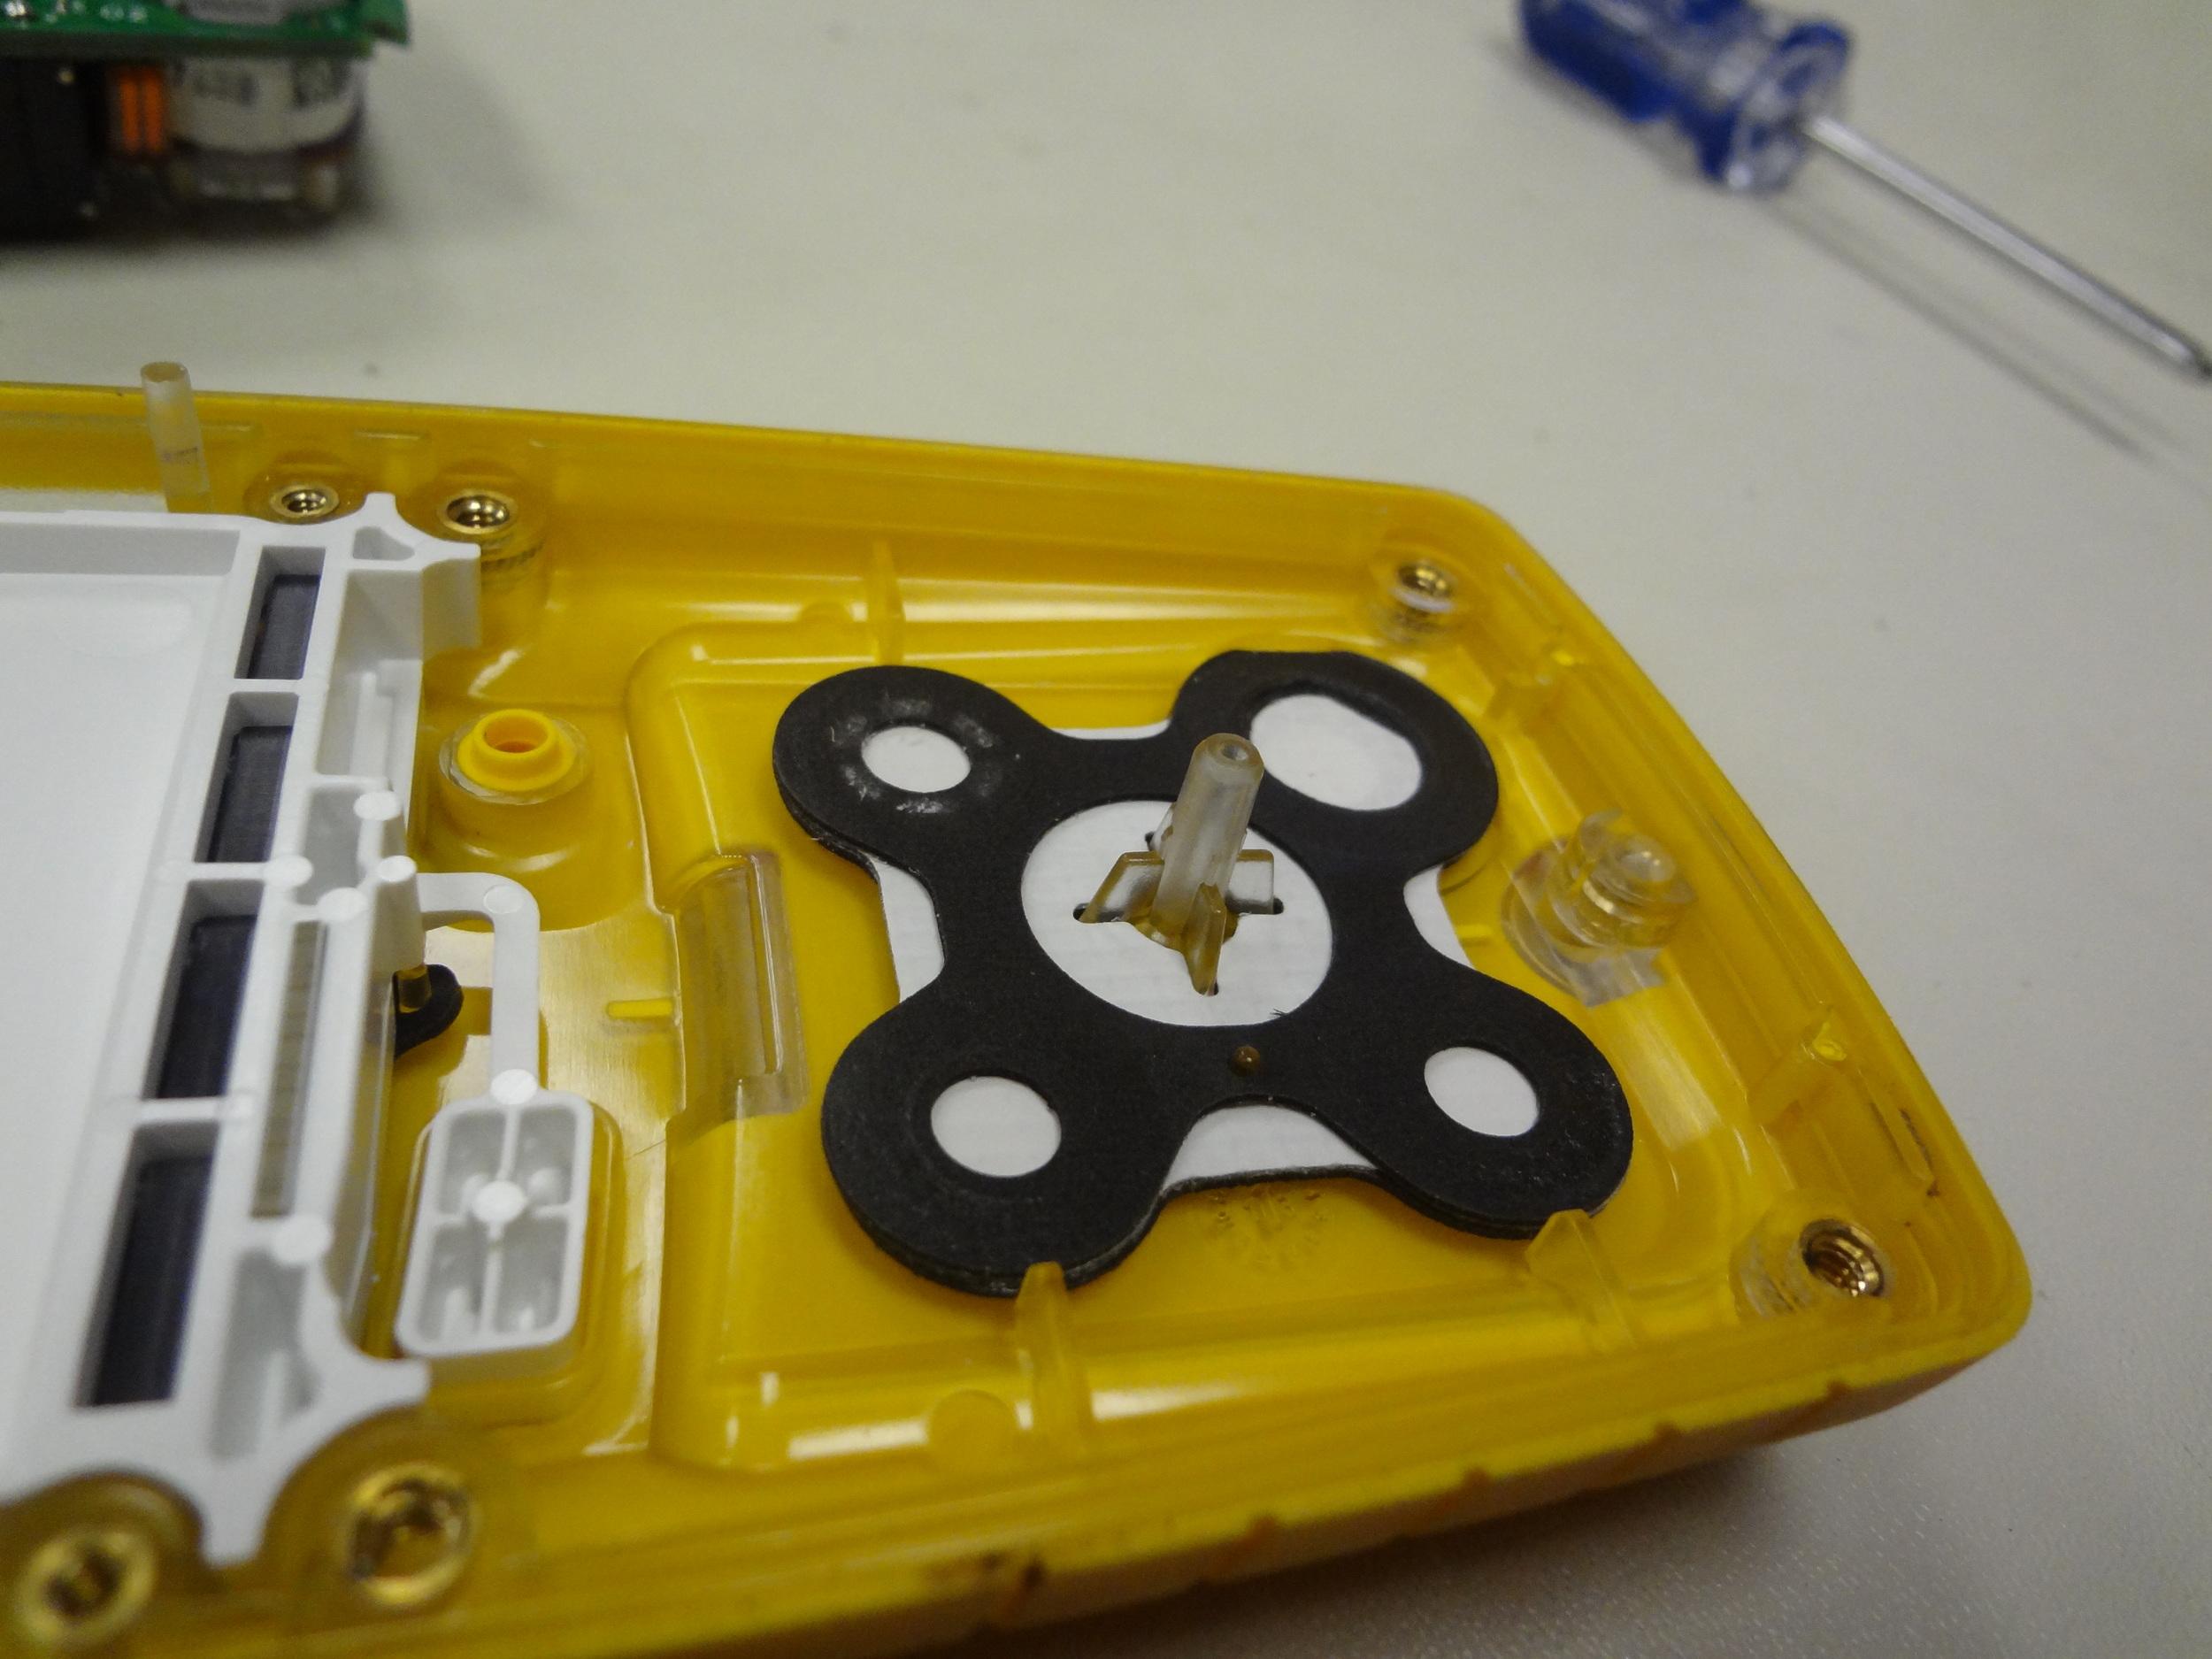 BW-Technologies-Gas-Alert-Max-XT-II-sensor-gasket-installed.JPG